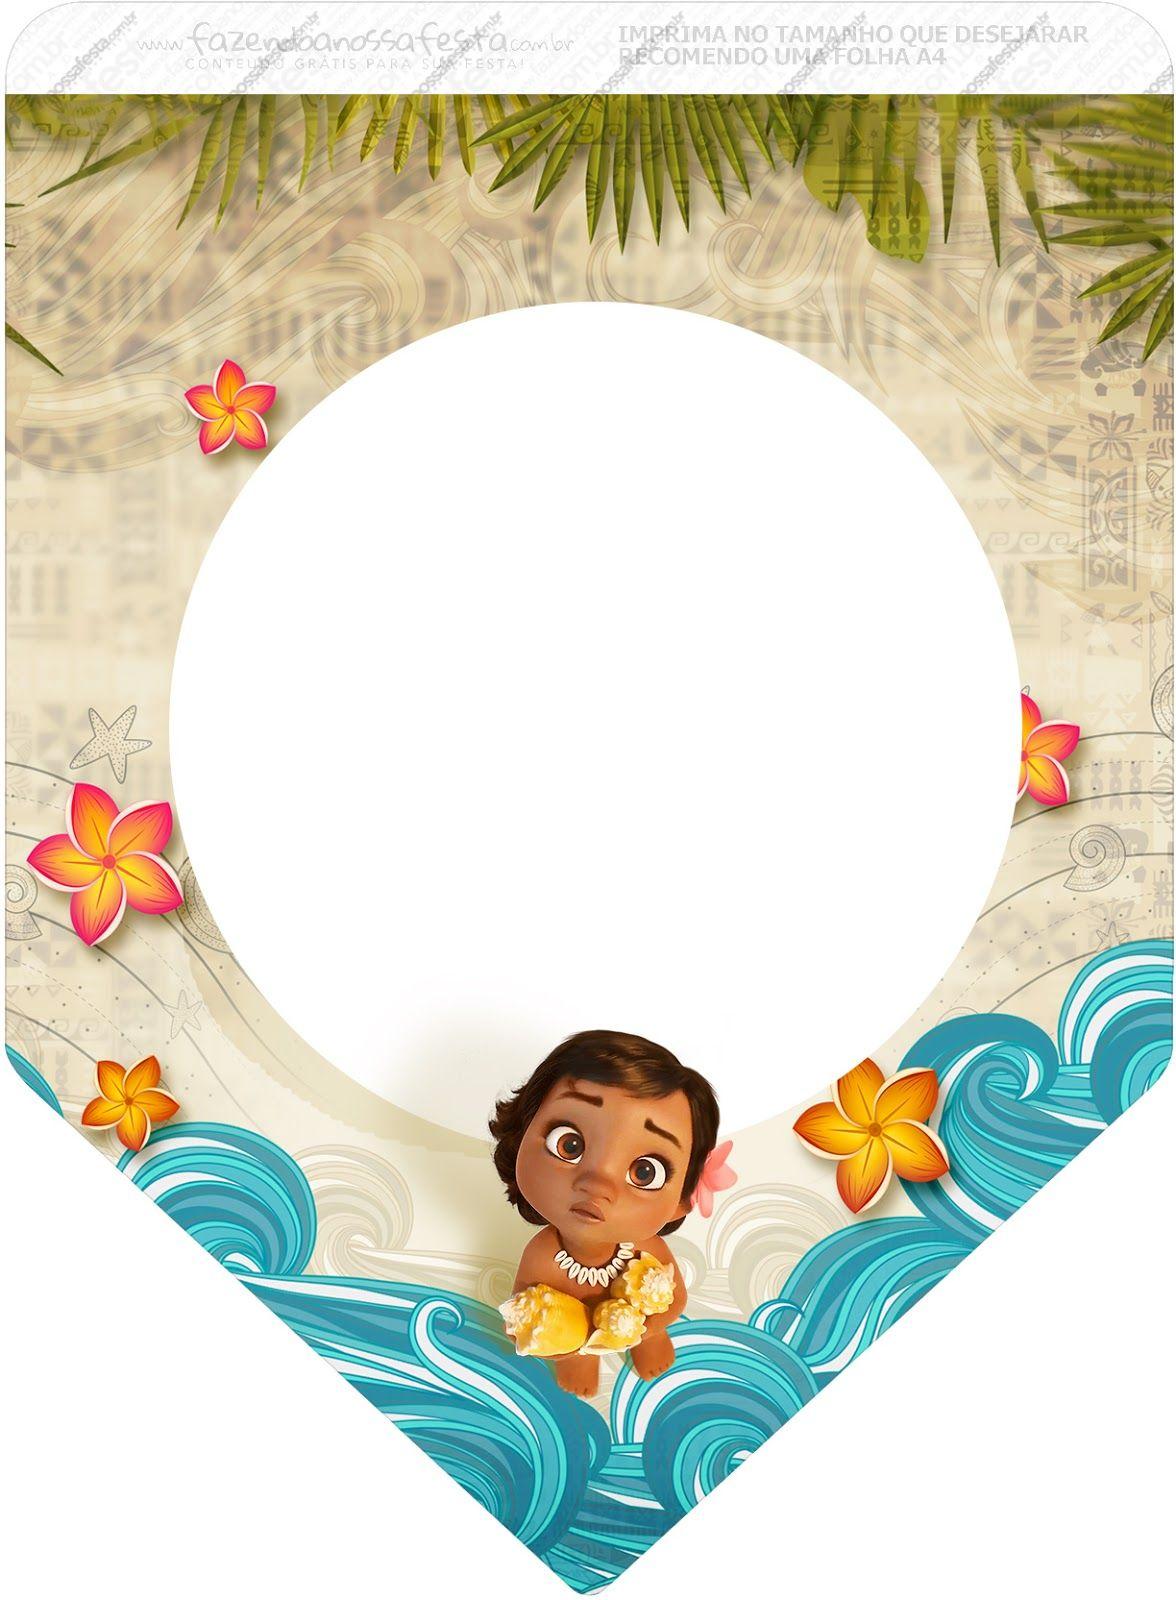 Moana Bebé: Imprimibles Gratis para Fiestas. | Moana | Pinterest | Moana, Moana party and Fiestas